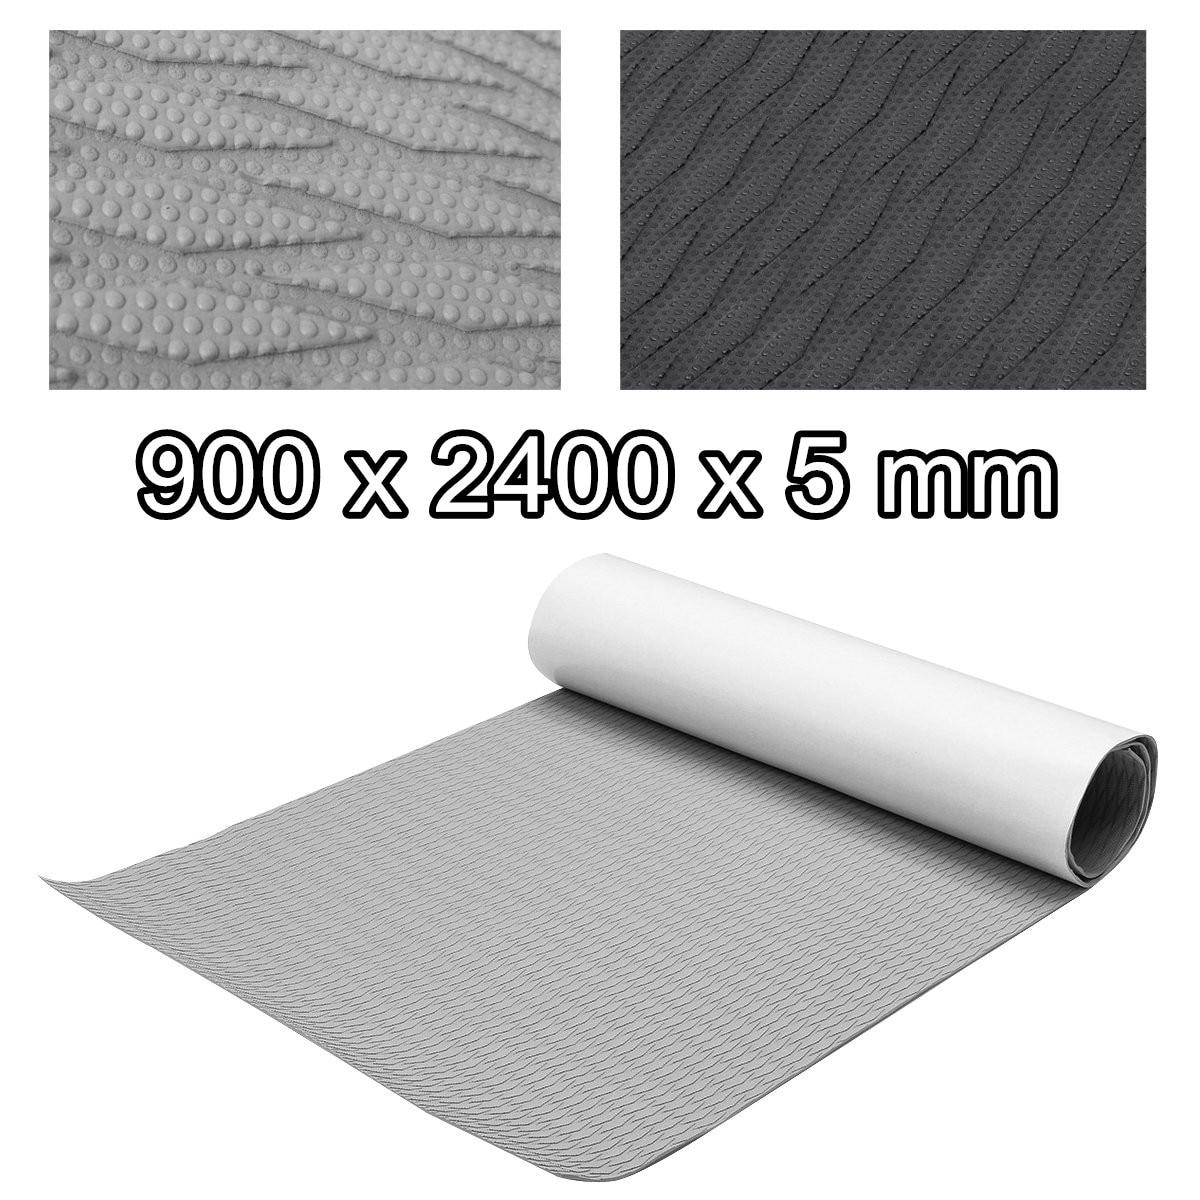 Self-Adhesive Foam Teak Decking EVA Foam Marine Flooring Faux Limo Boat Decking Sheet Accessories Marine 2 Colors 900x2400x5mm